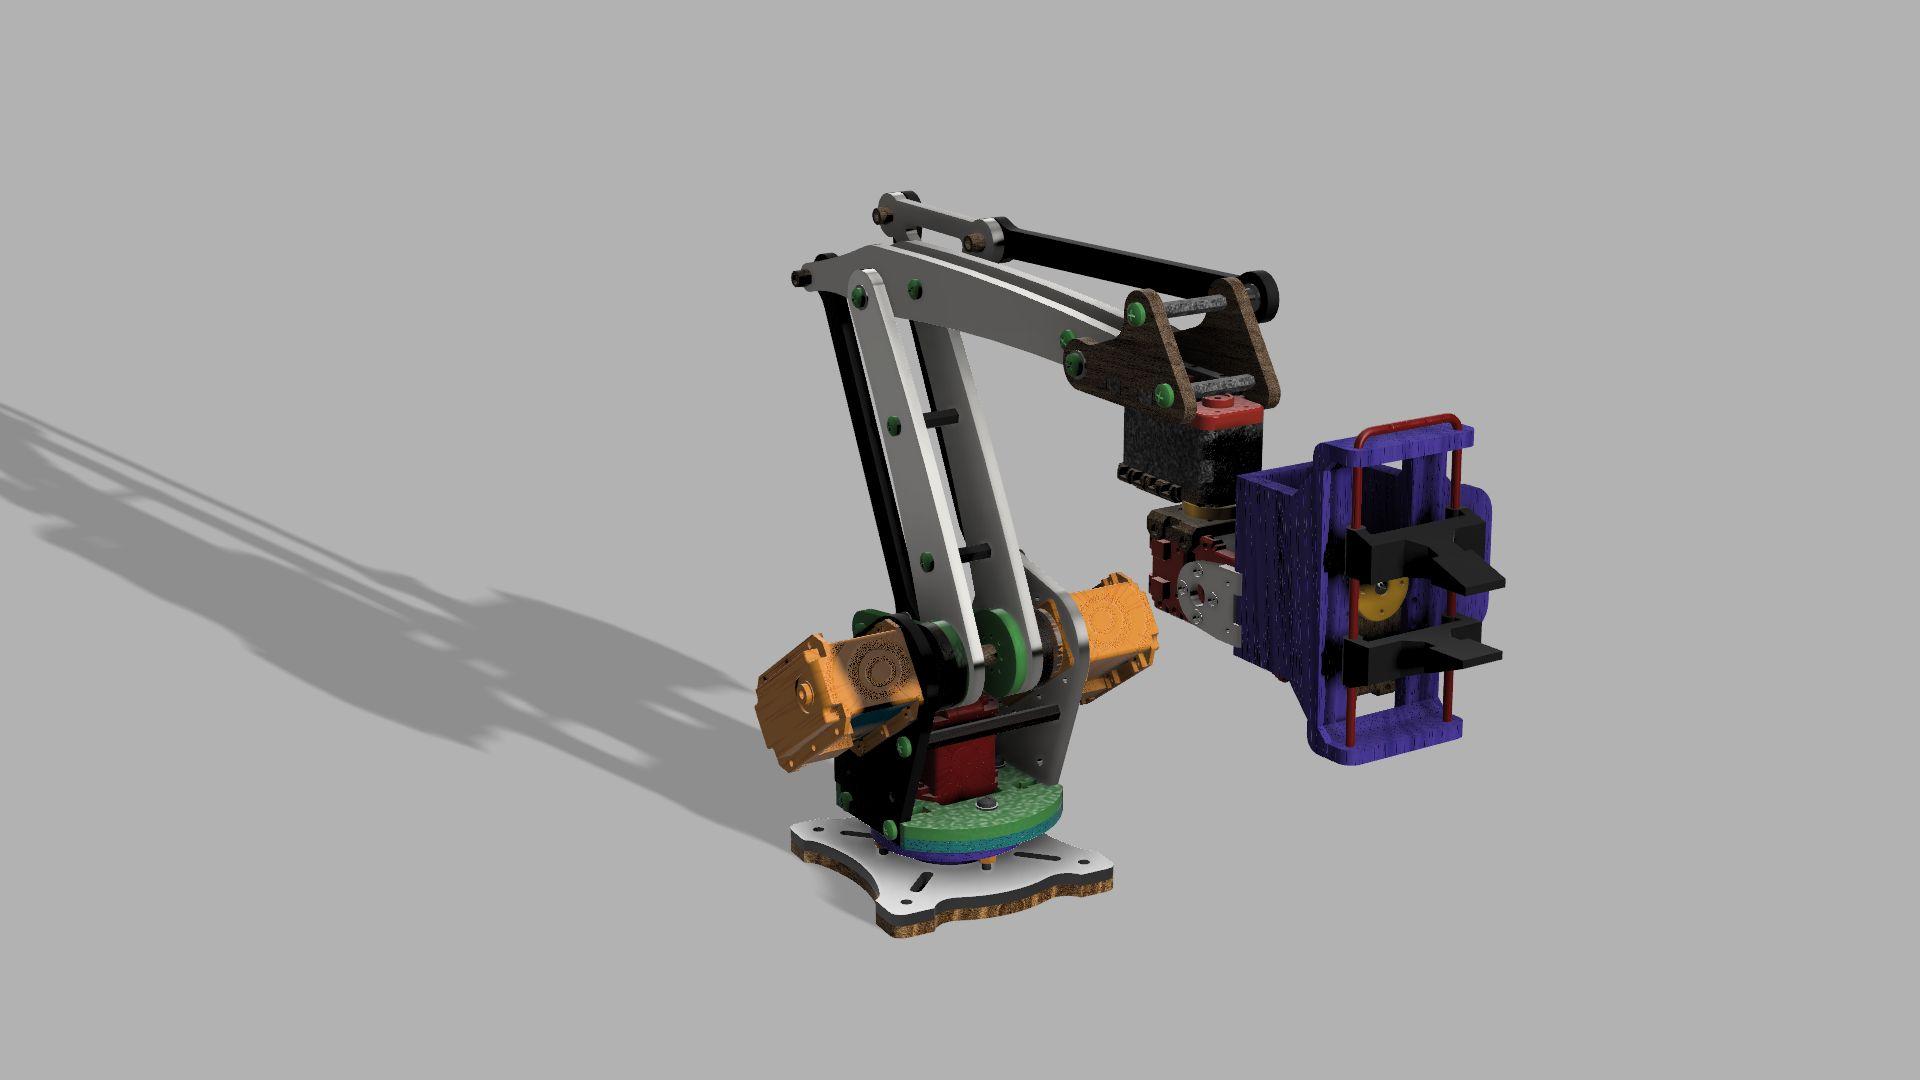 Robotic-crane-01-3500-3500